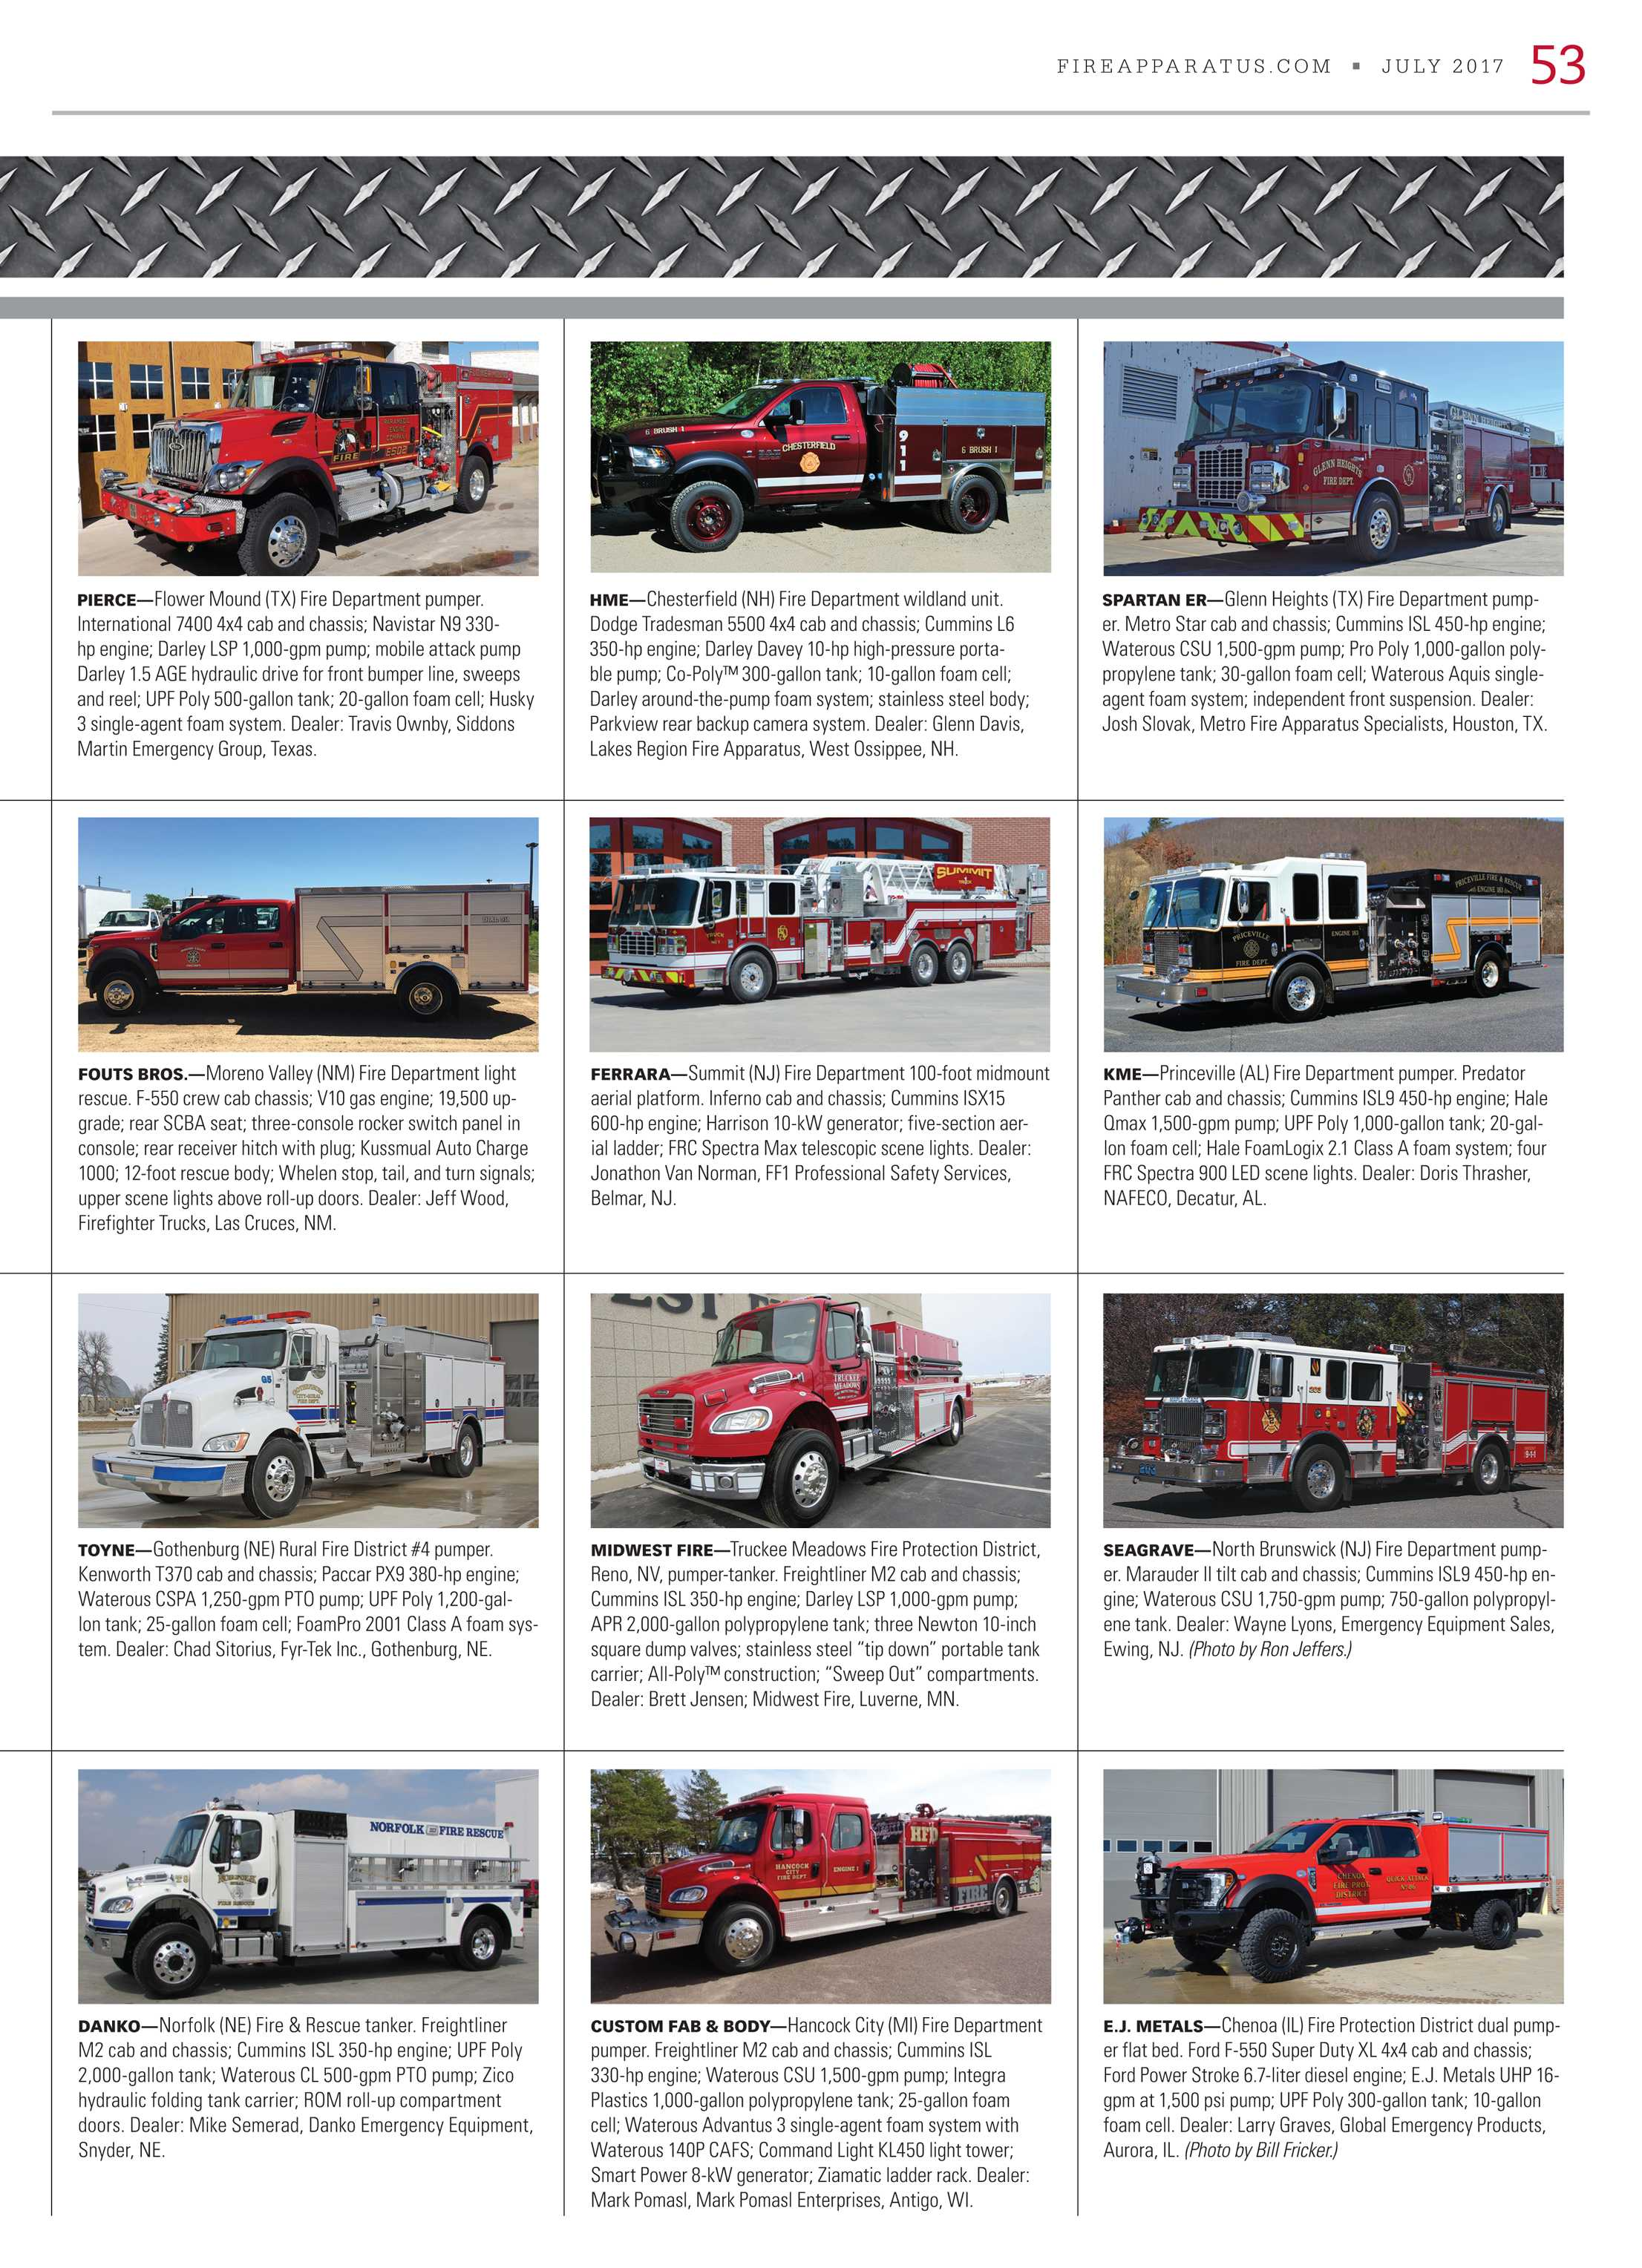 Fire Apparatus Magazine - July 2017 - page 53